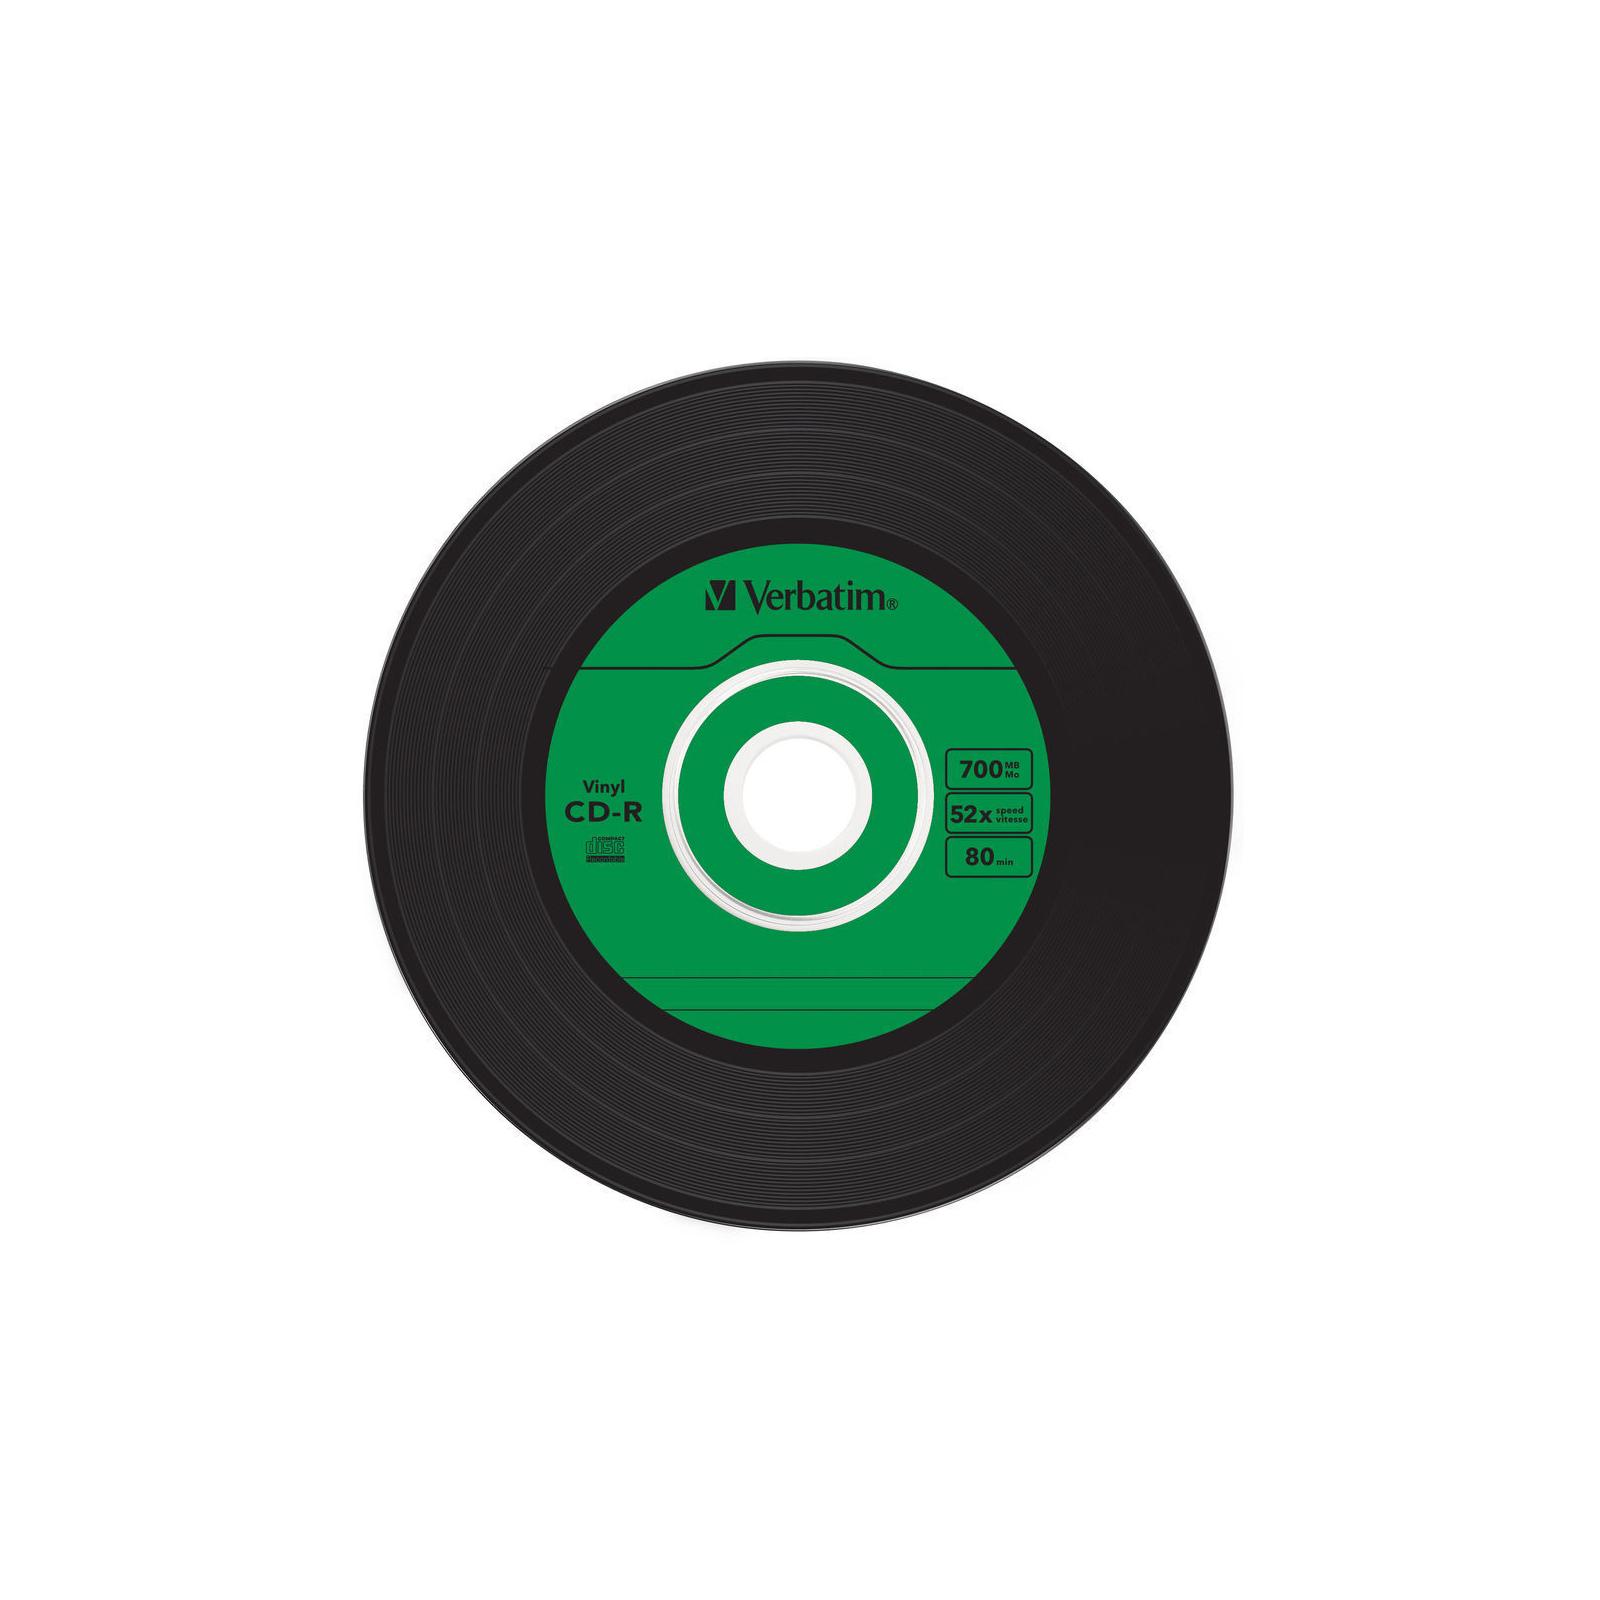 Диск CD Verbatim 700Mb 52x Slim case Vinyl AZO (43426) изображение 6